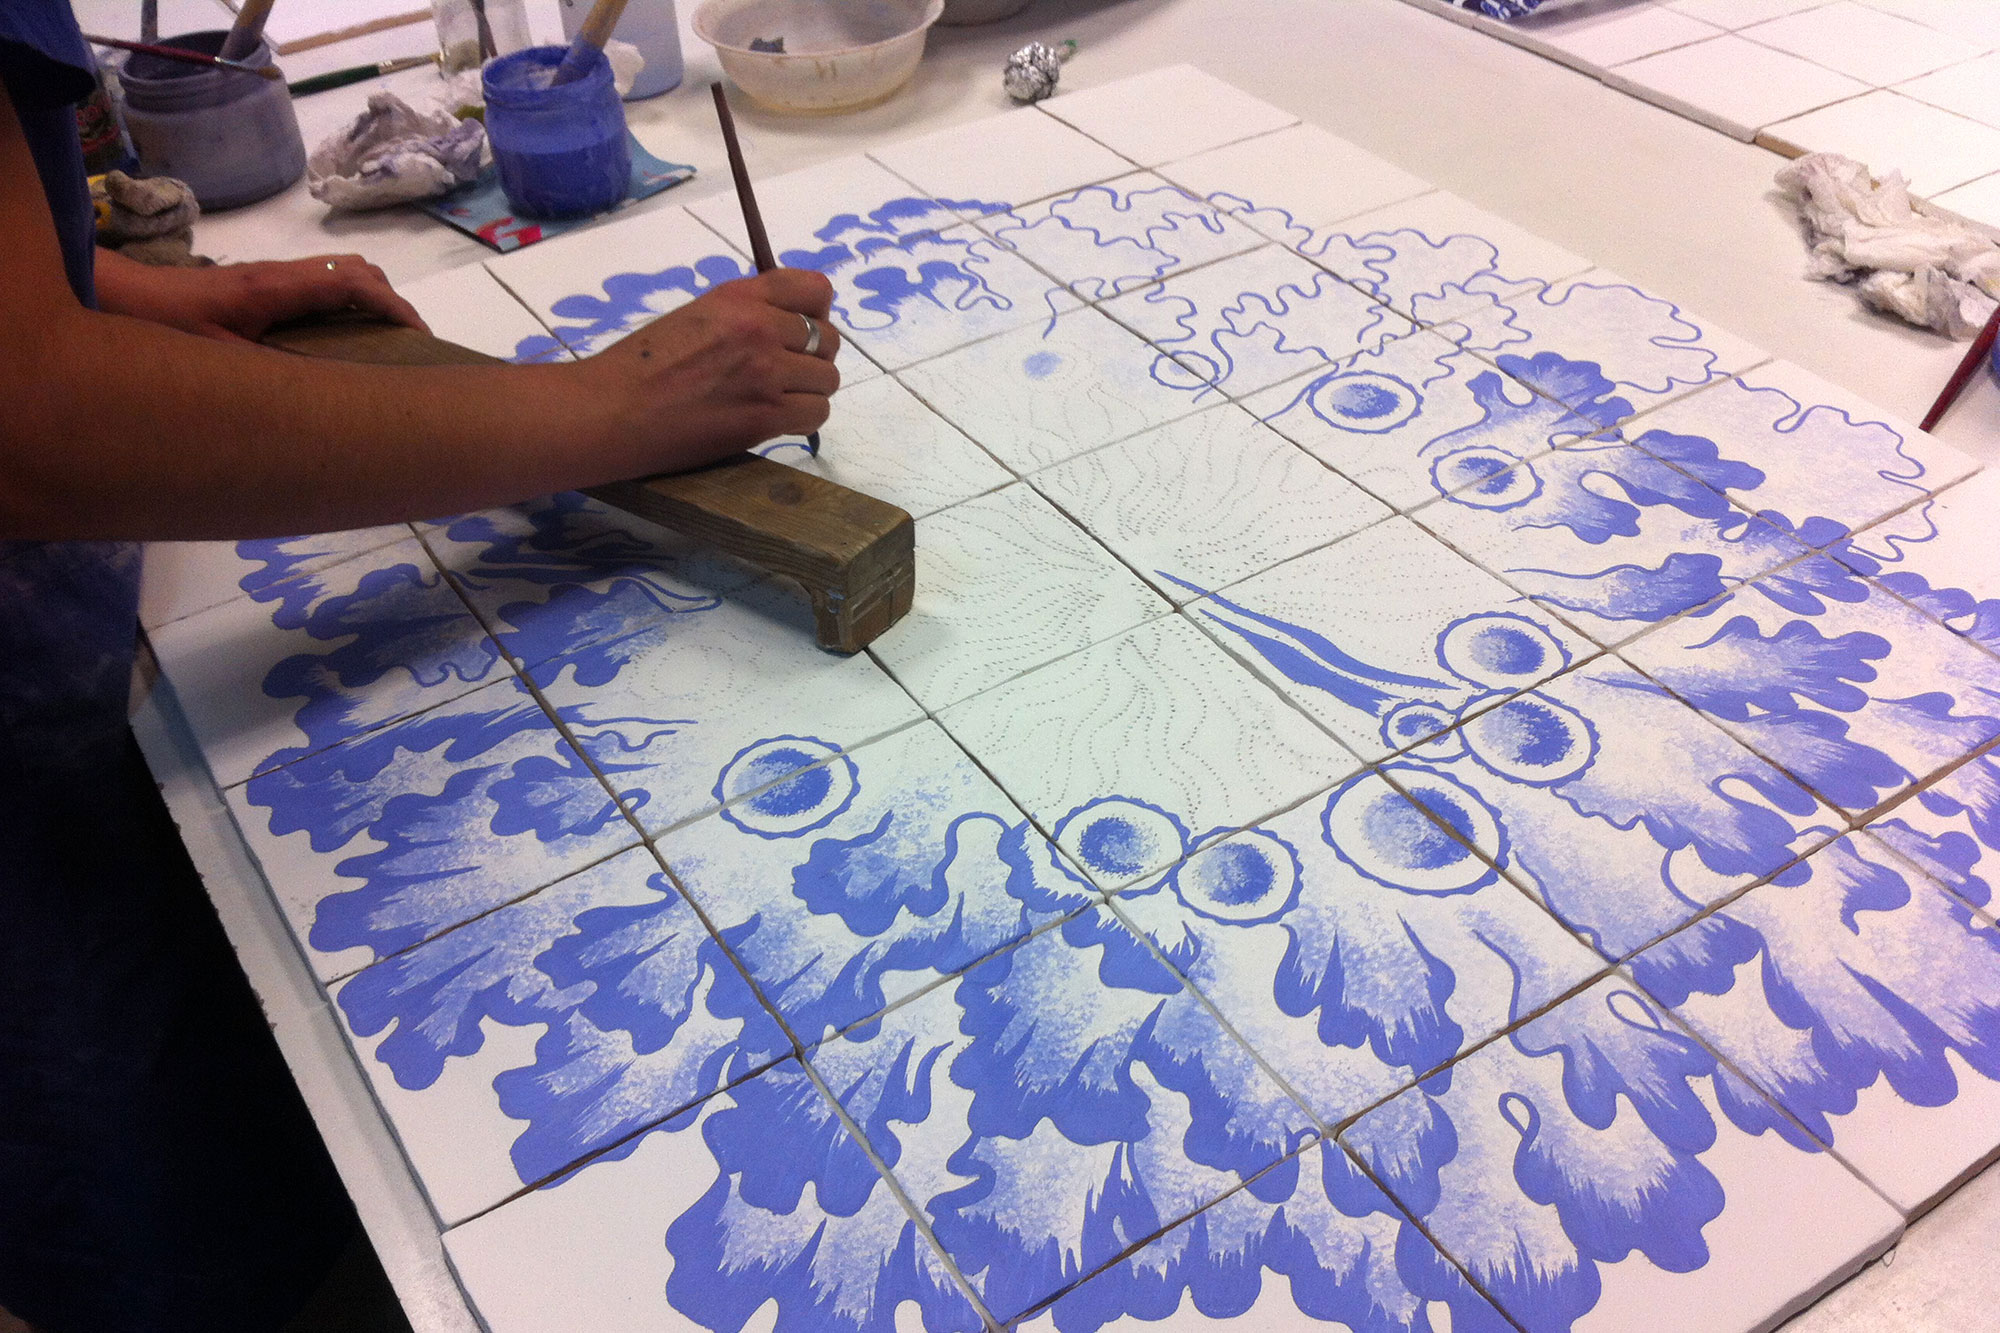 murales cermicos detalles - Murales Cerámicos